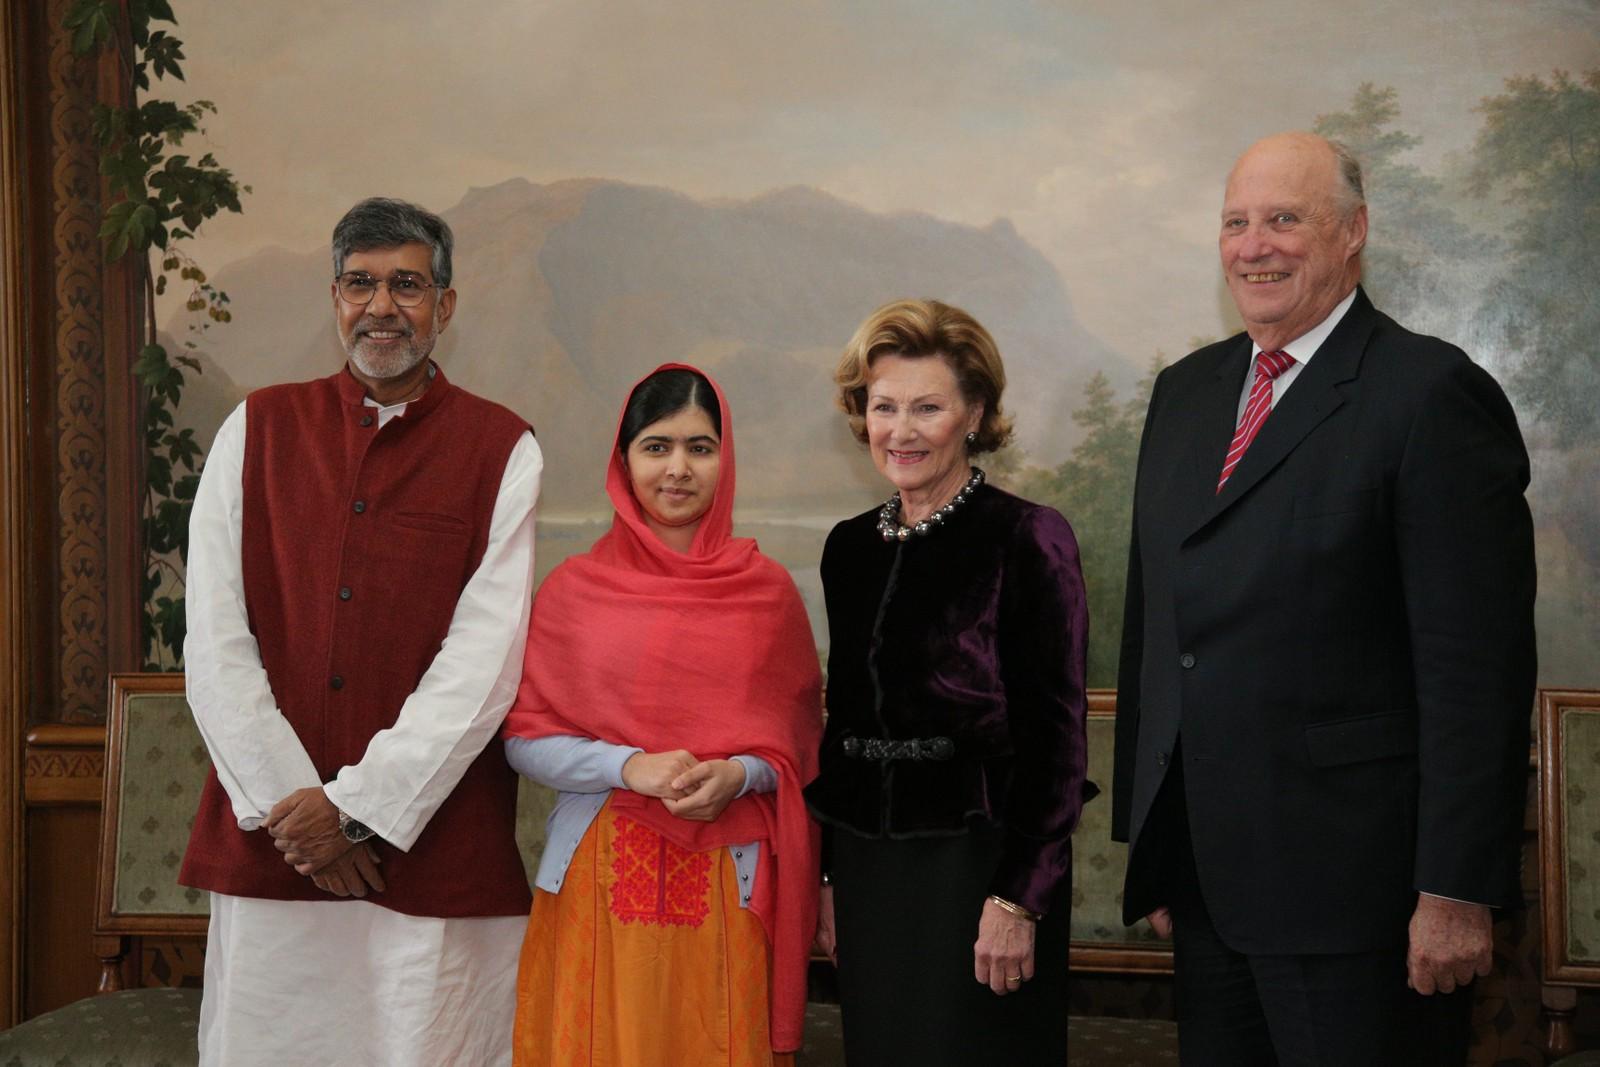 MED KONGEN OG DRONNINGEN: Nobels Fredspris 2014. Kong Harald, dronning Sonja, tar imot vinnerne av årets Nobels Fredspris: Kailash Satyarthi og Malala Yousafzai til audiens på Slottet onsdag.